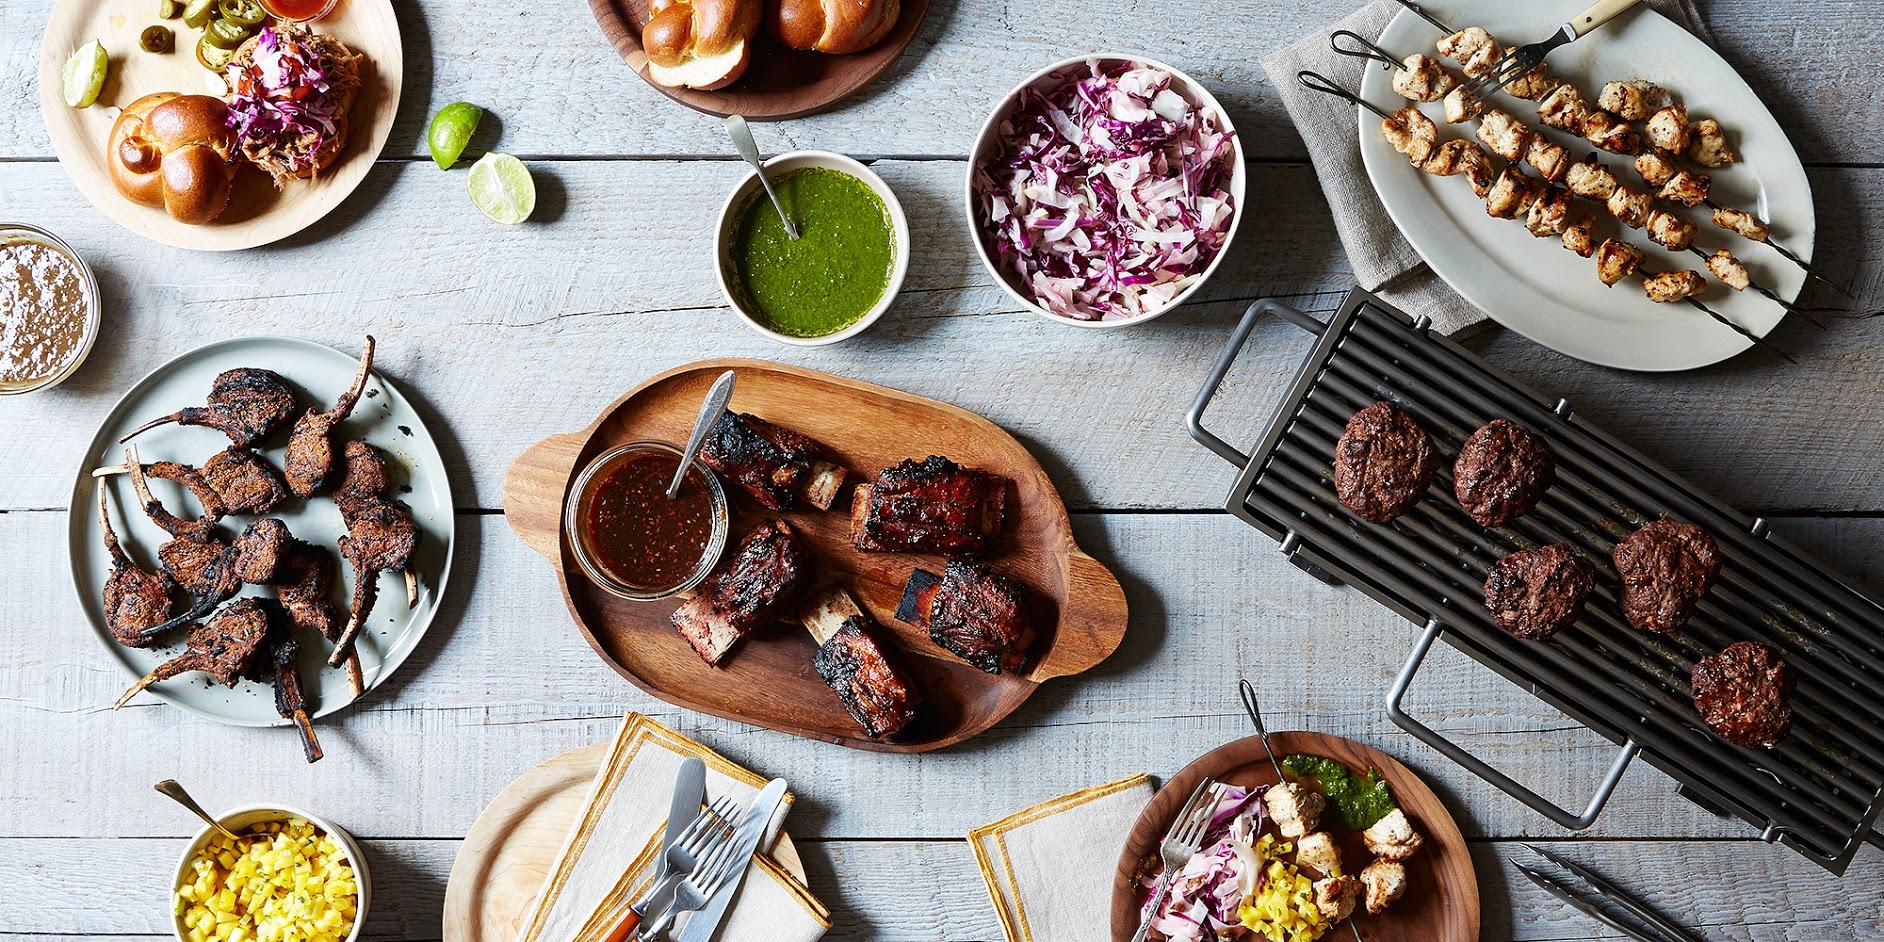 Summer Entertaining An Upscale Backyard Barbecue